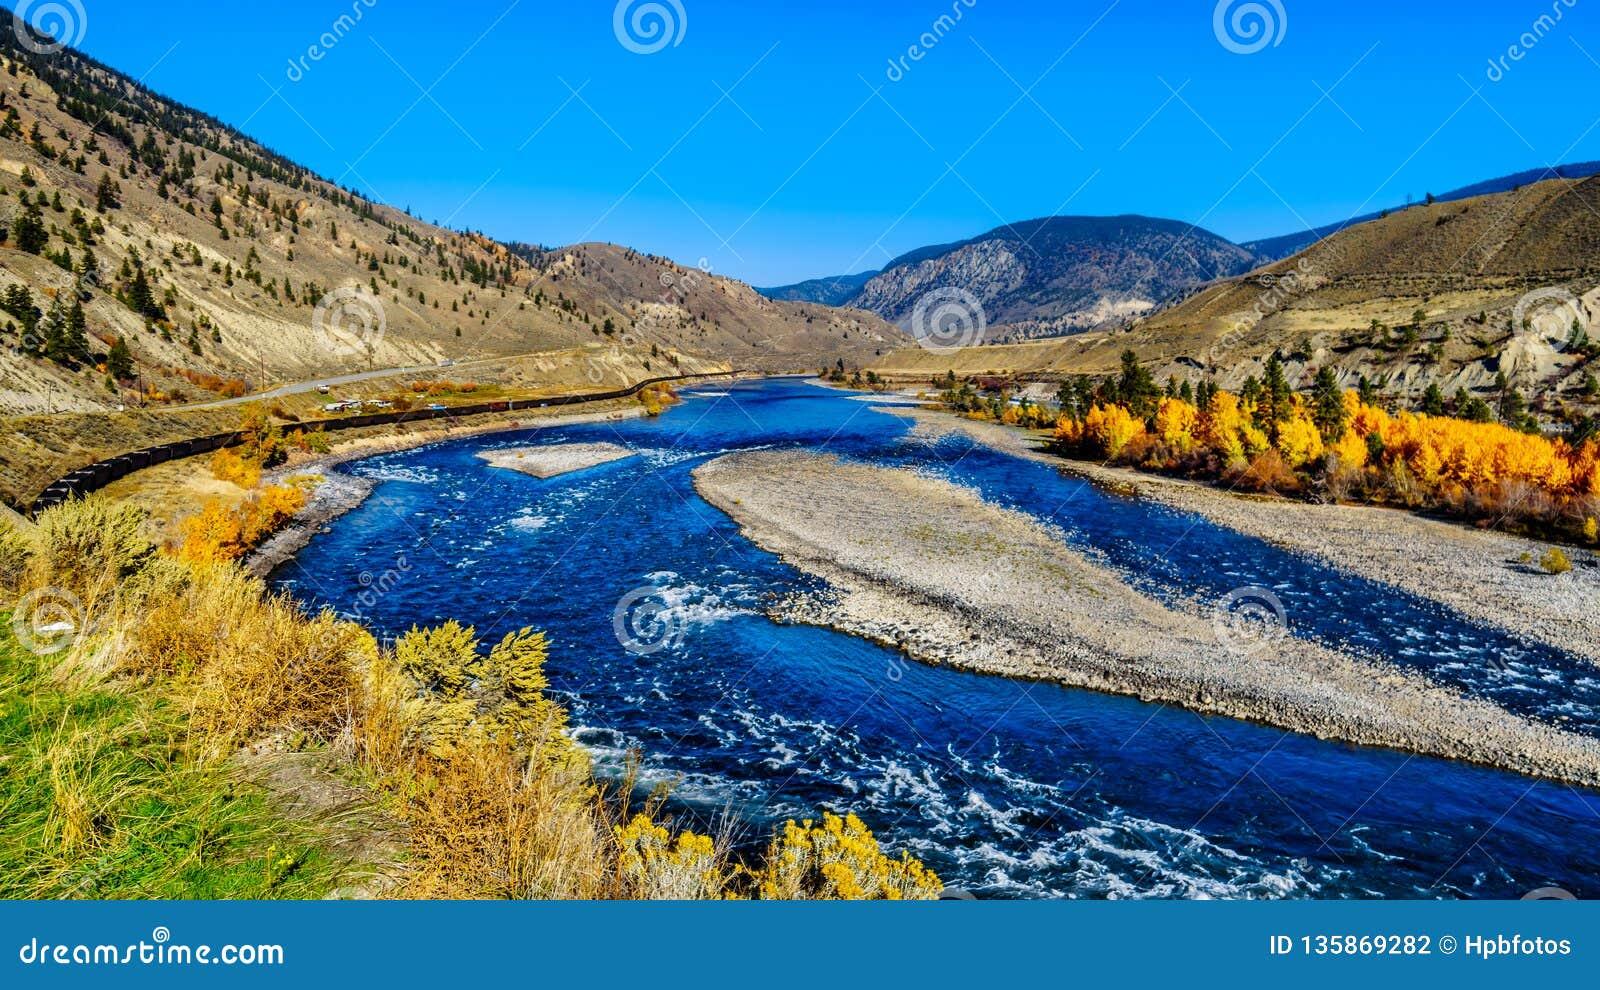 The Thompson River at Spences Bridge in BC Canada